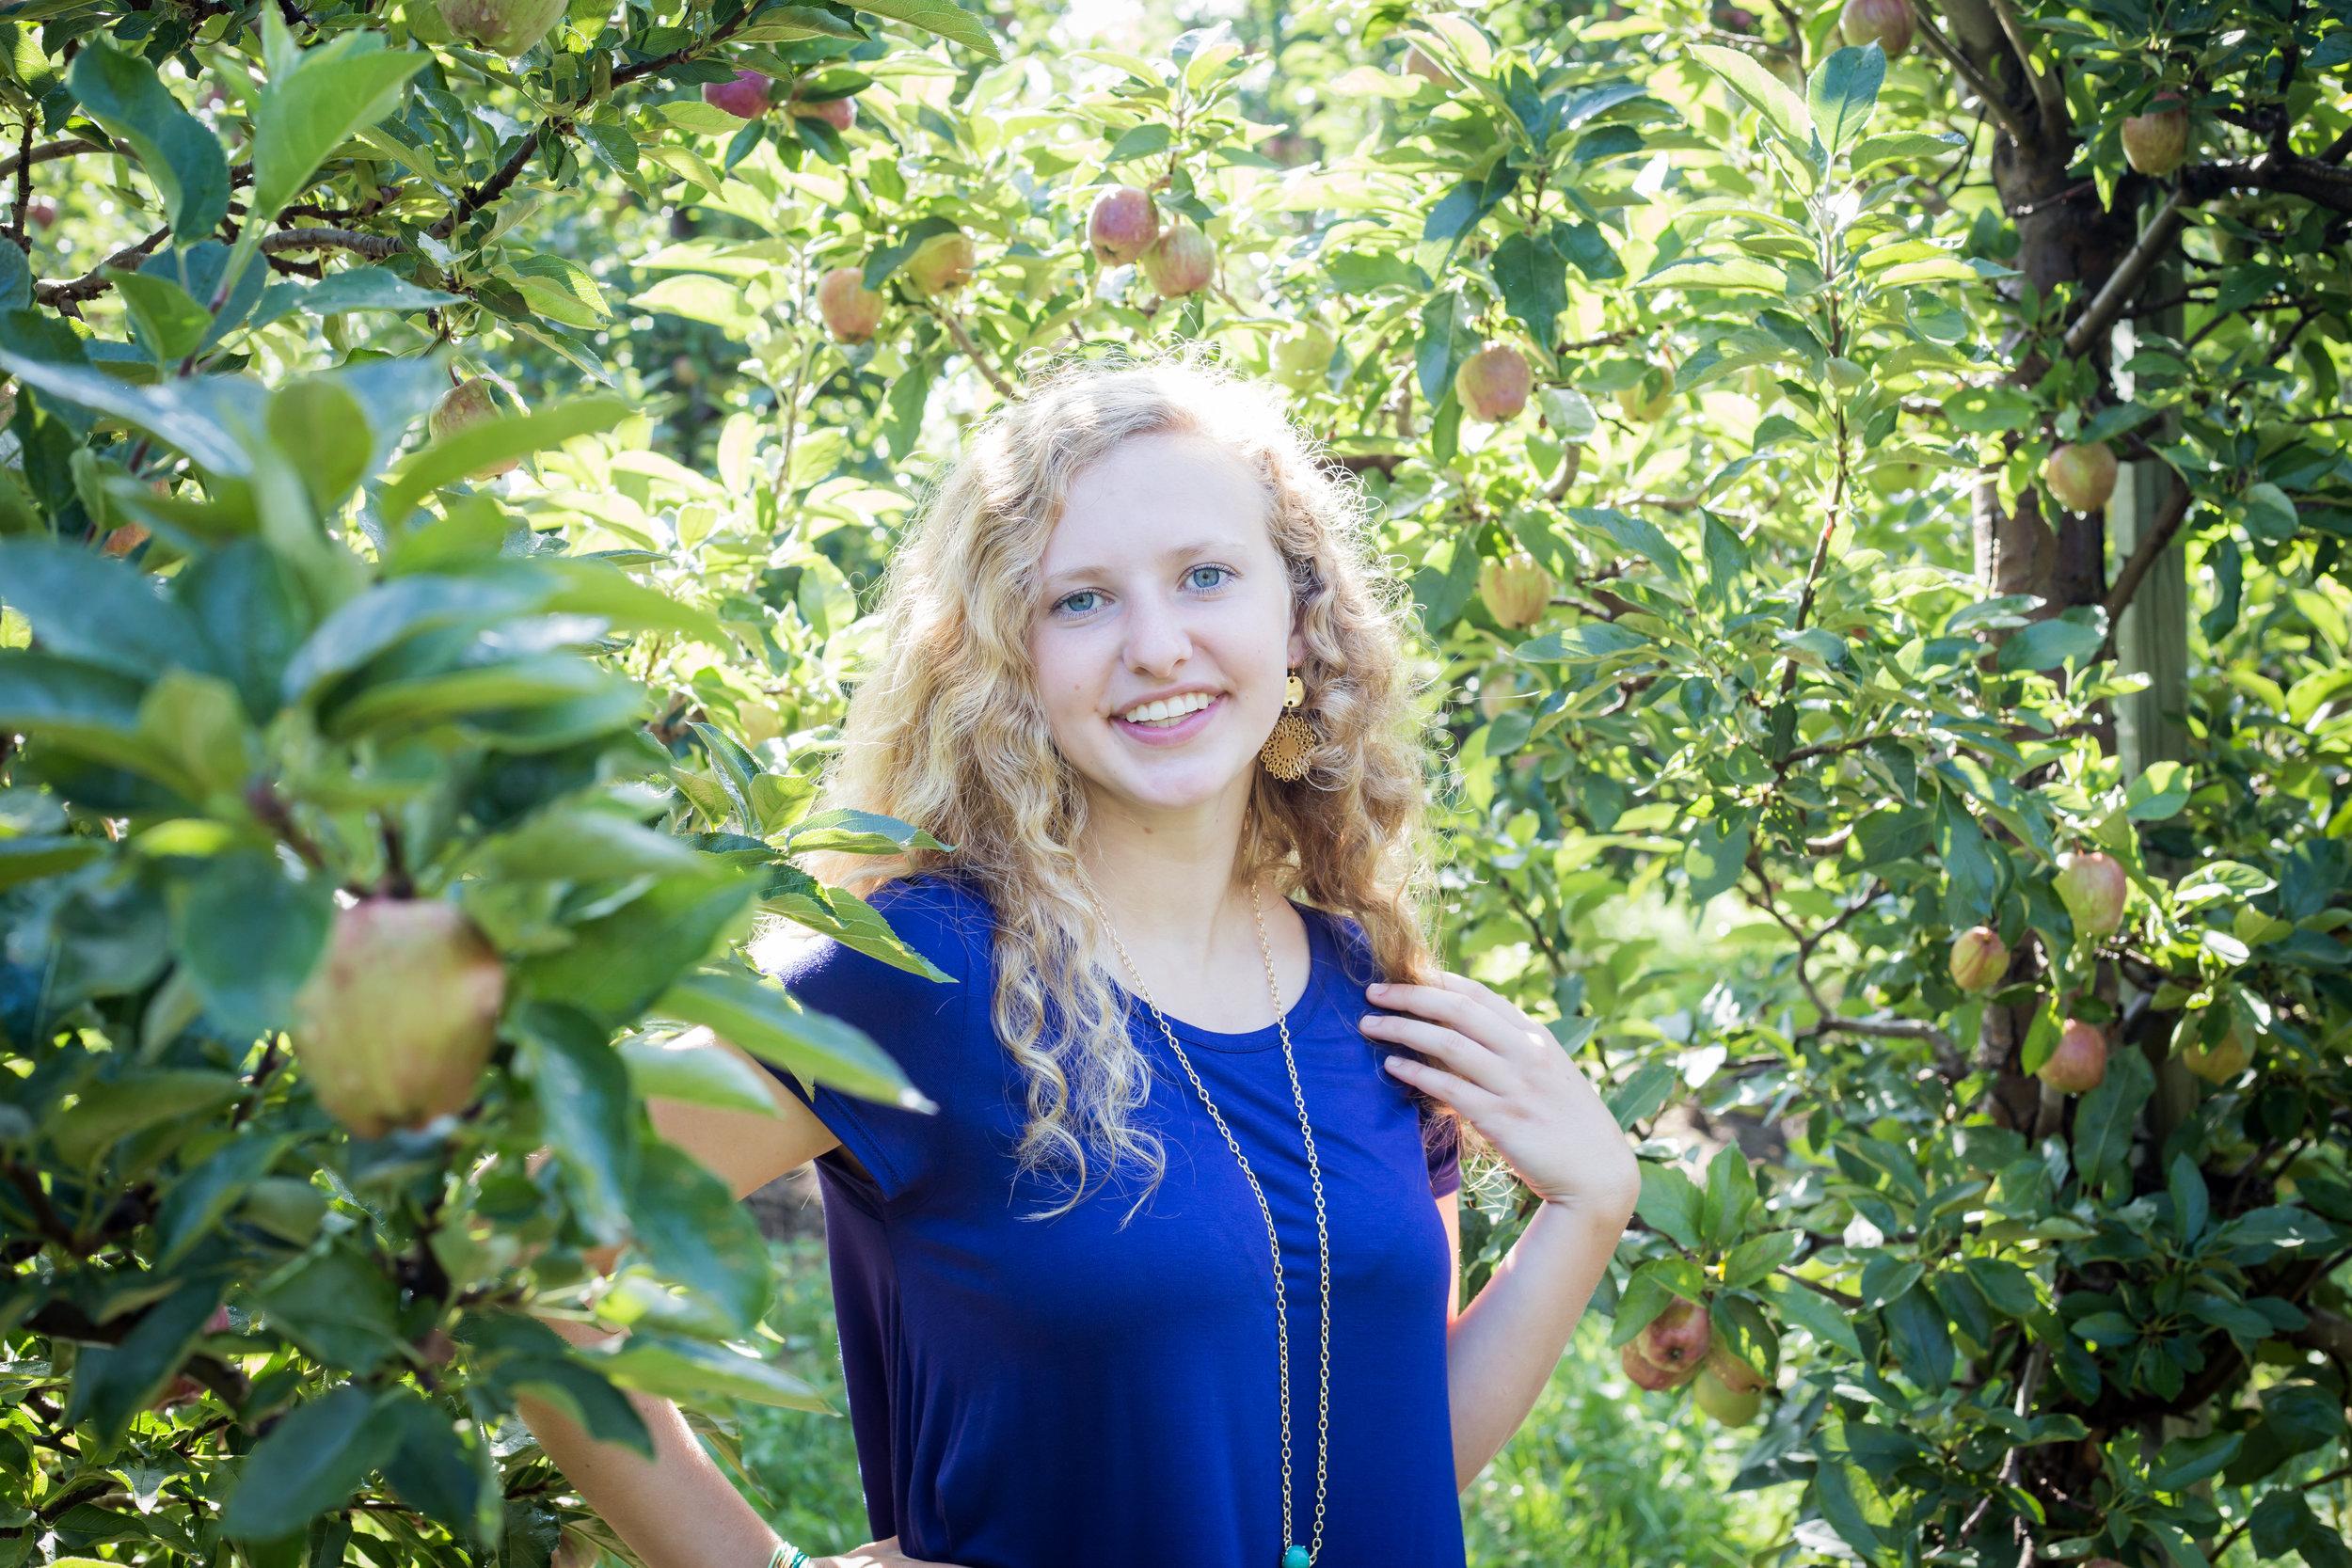 Michigan apple orchard senior blue top blond hair